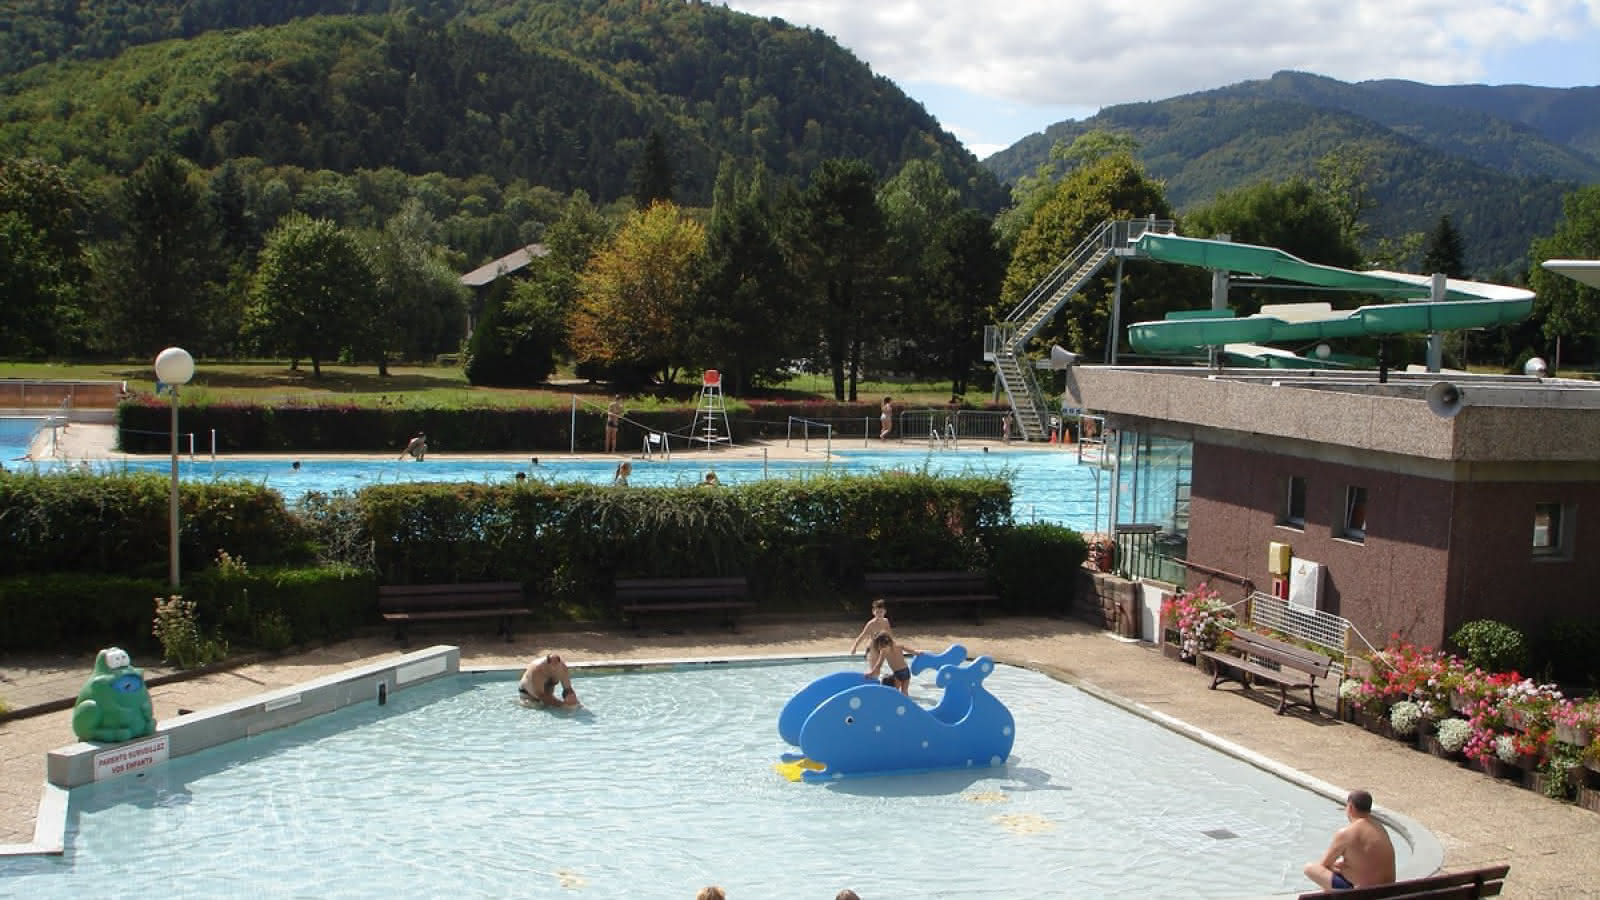 Centre Aquatique - Piscine De Wesserling - Fellering | Visit ... serapportantà Piscine Wesserling